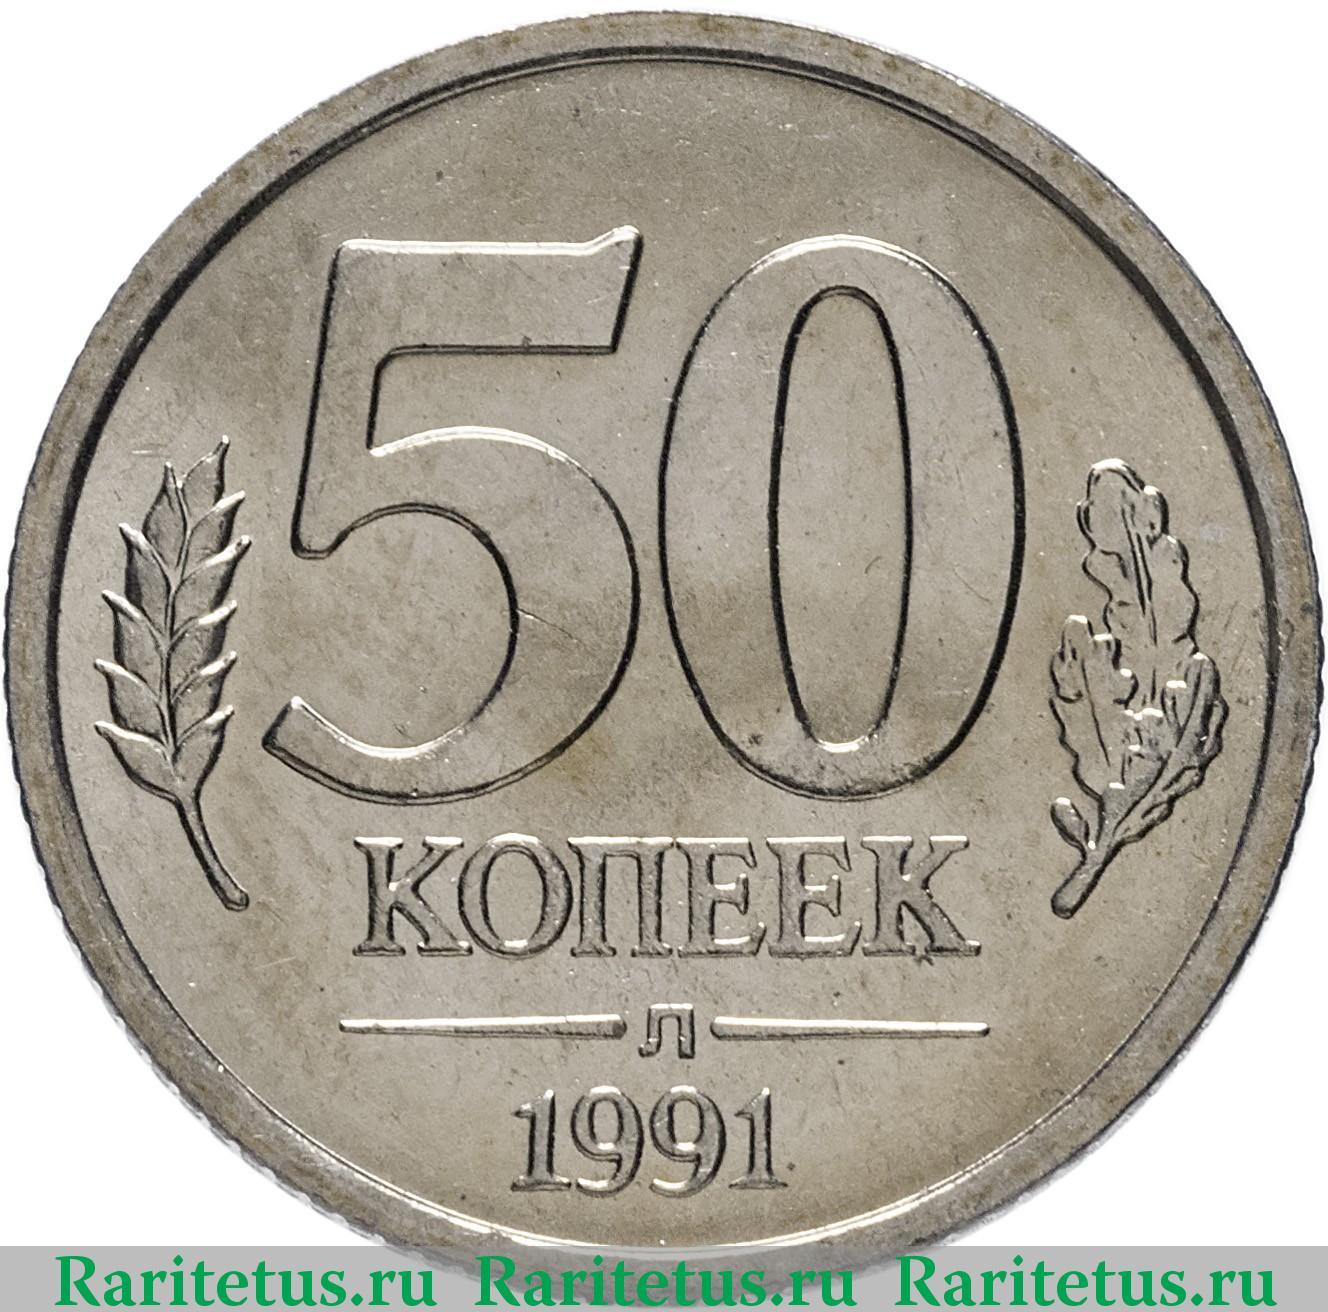 50 копеек 1991 гкчп года цена монета 1730